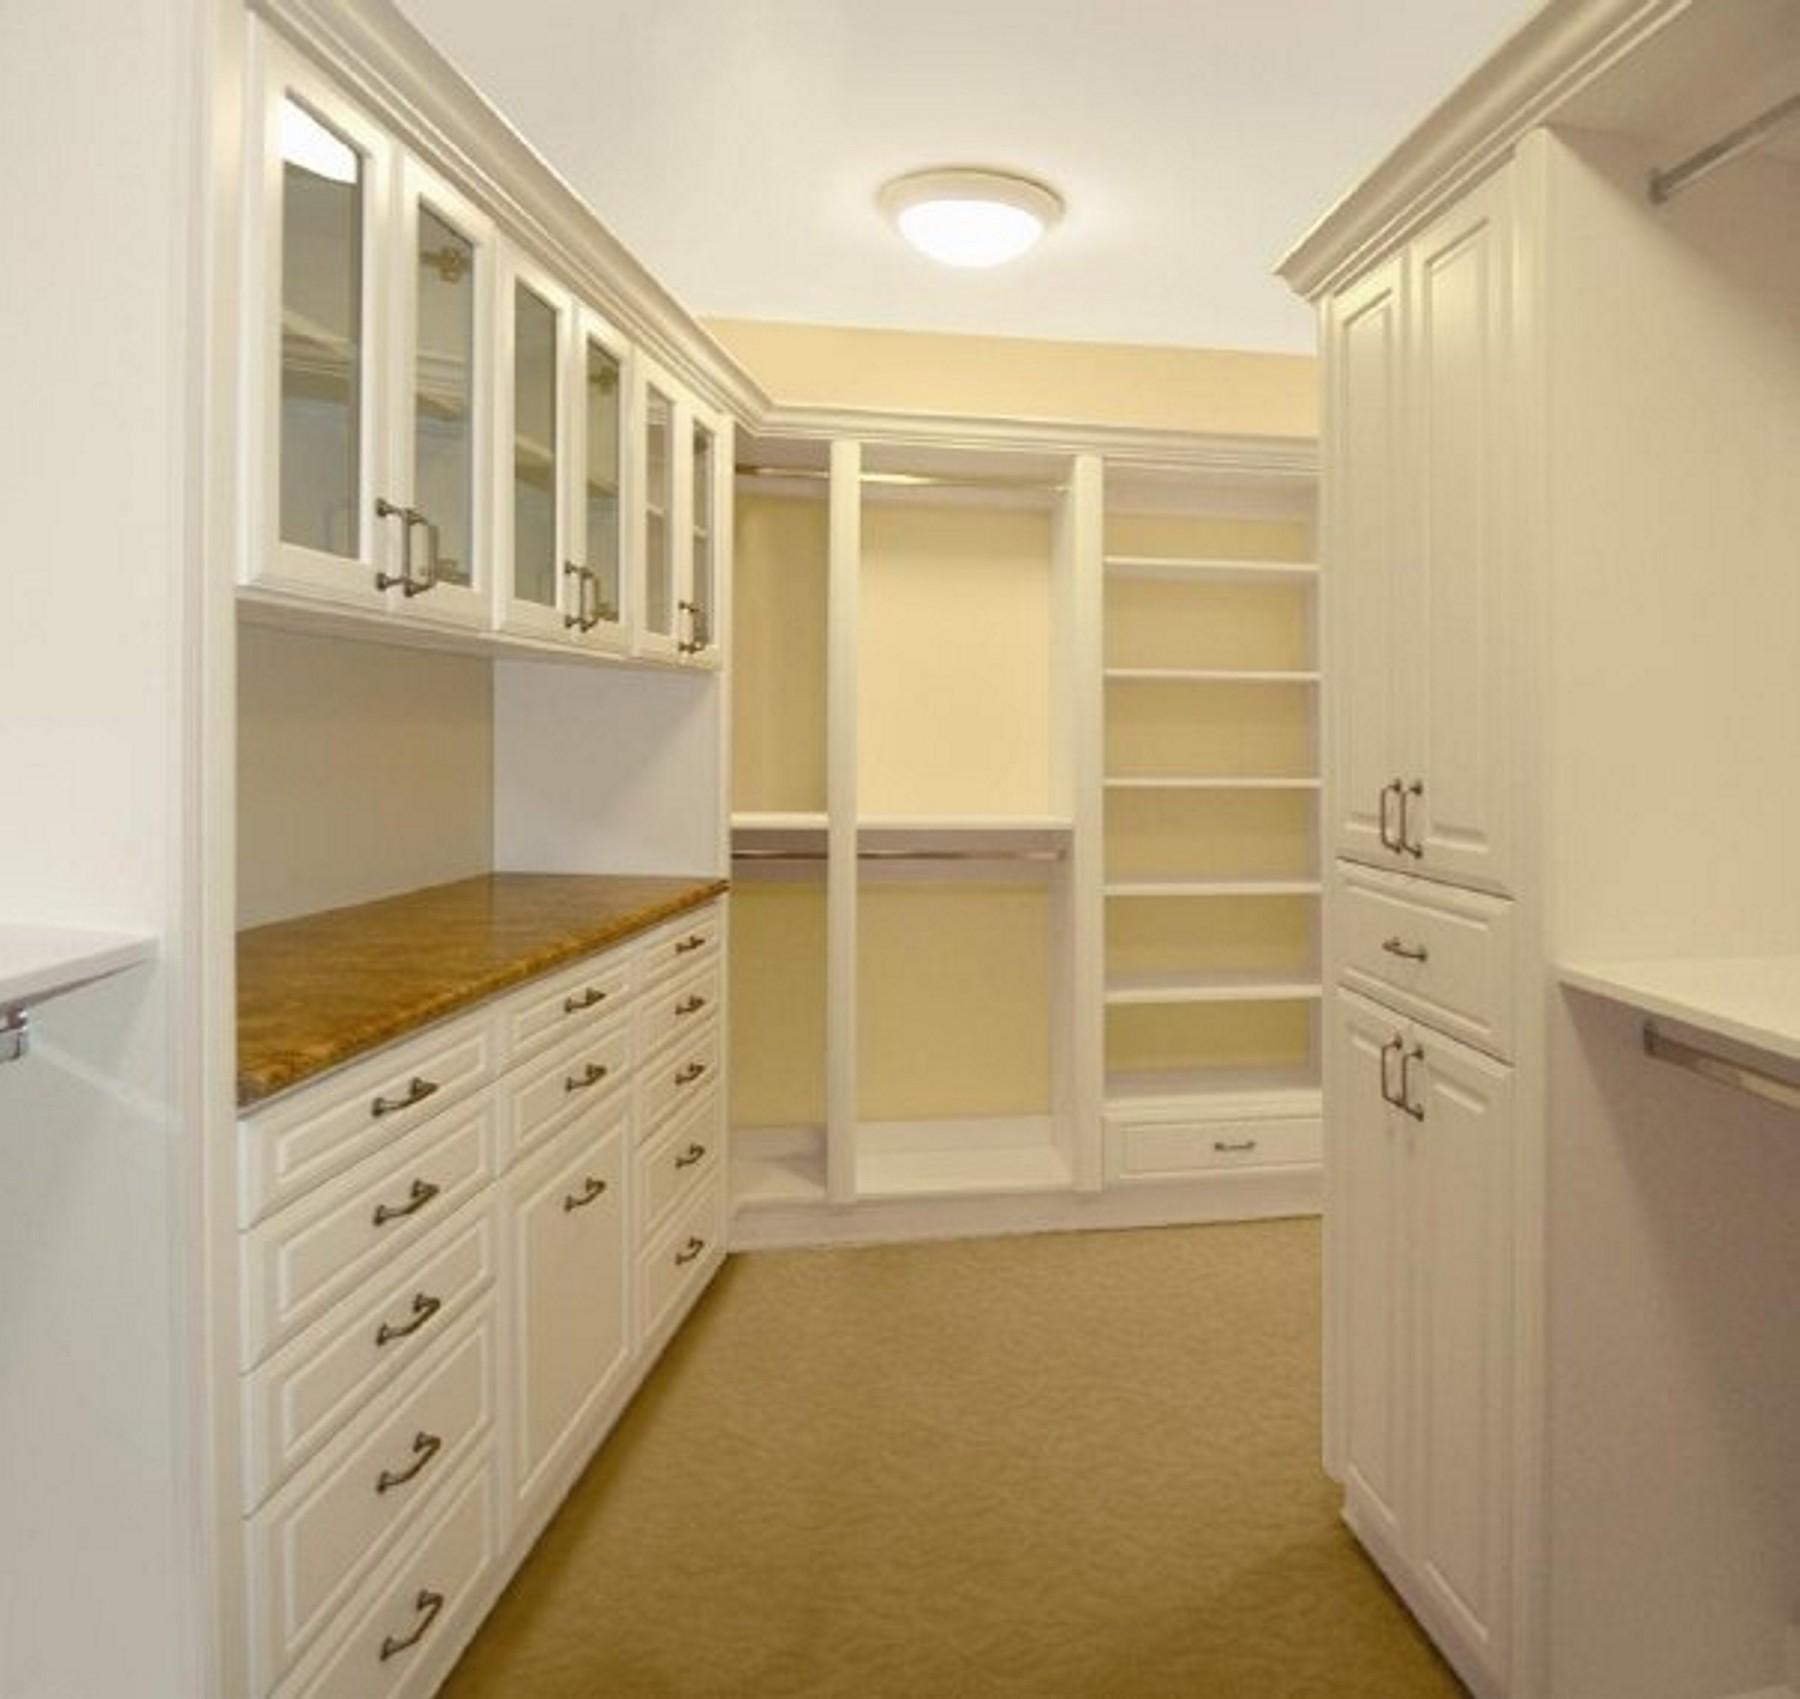 Cly Closets 4630 South Arville Suite E F Las Vegas Nv 89103 Yp